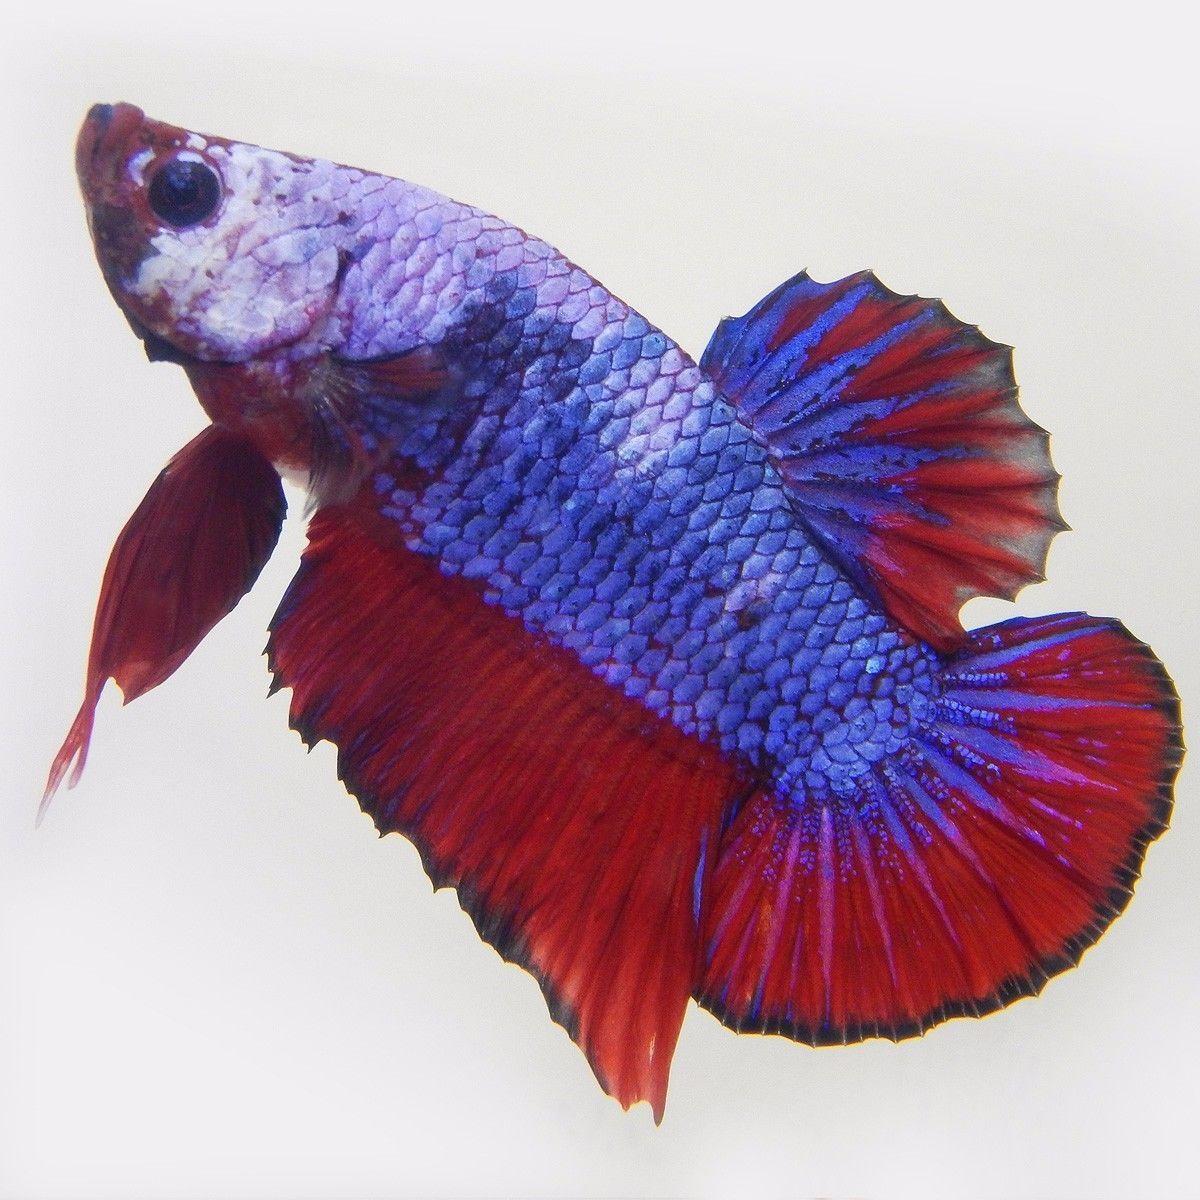 Live Betta Fish Male FANCY MARBLE DRAGON | Betta and Betta fish